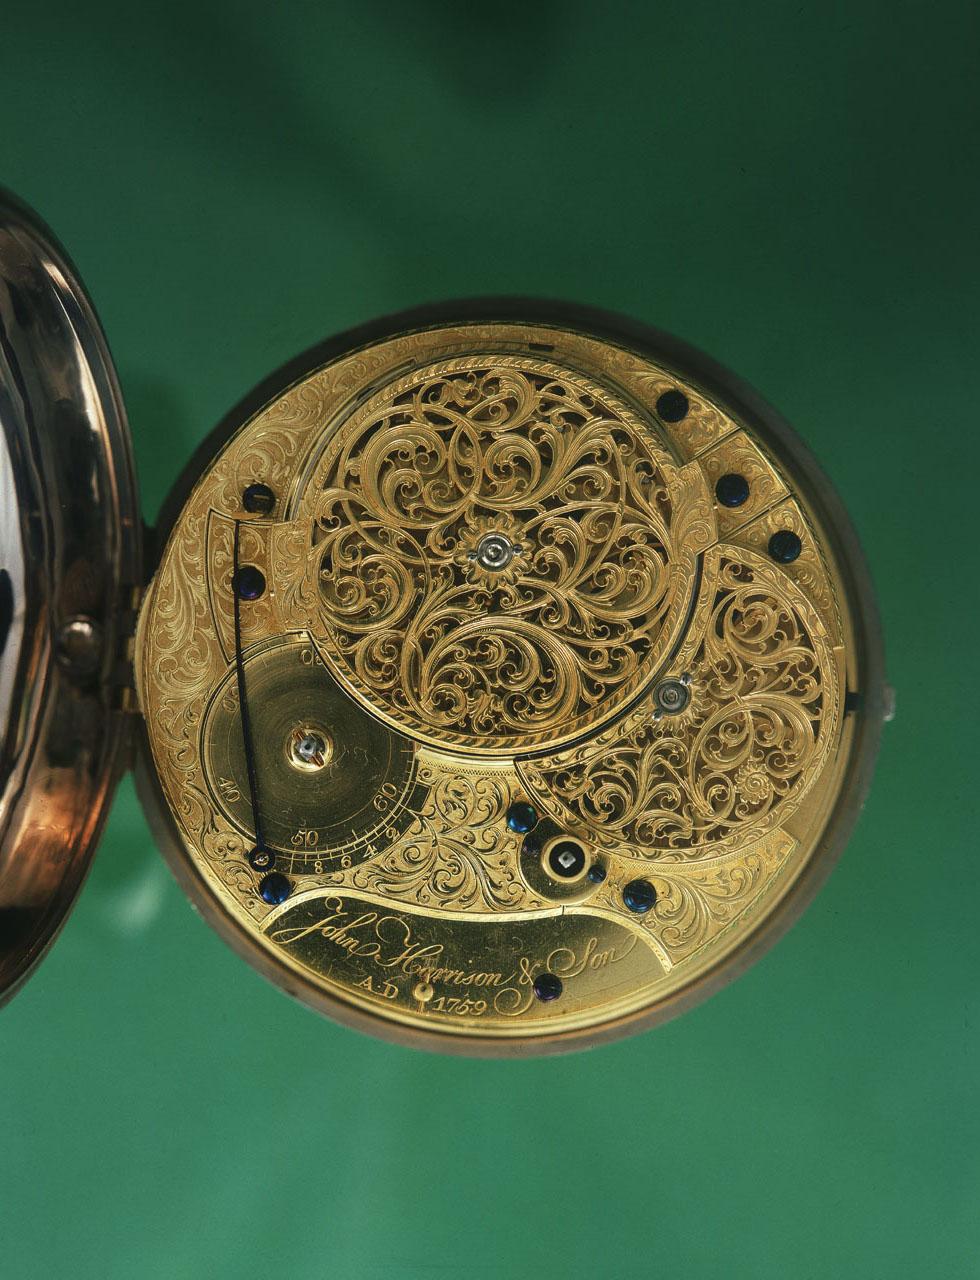 An image showing 'Marine timekeeper (H3), open upper plate'